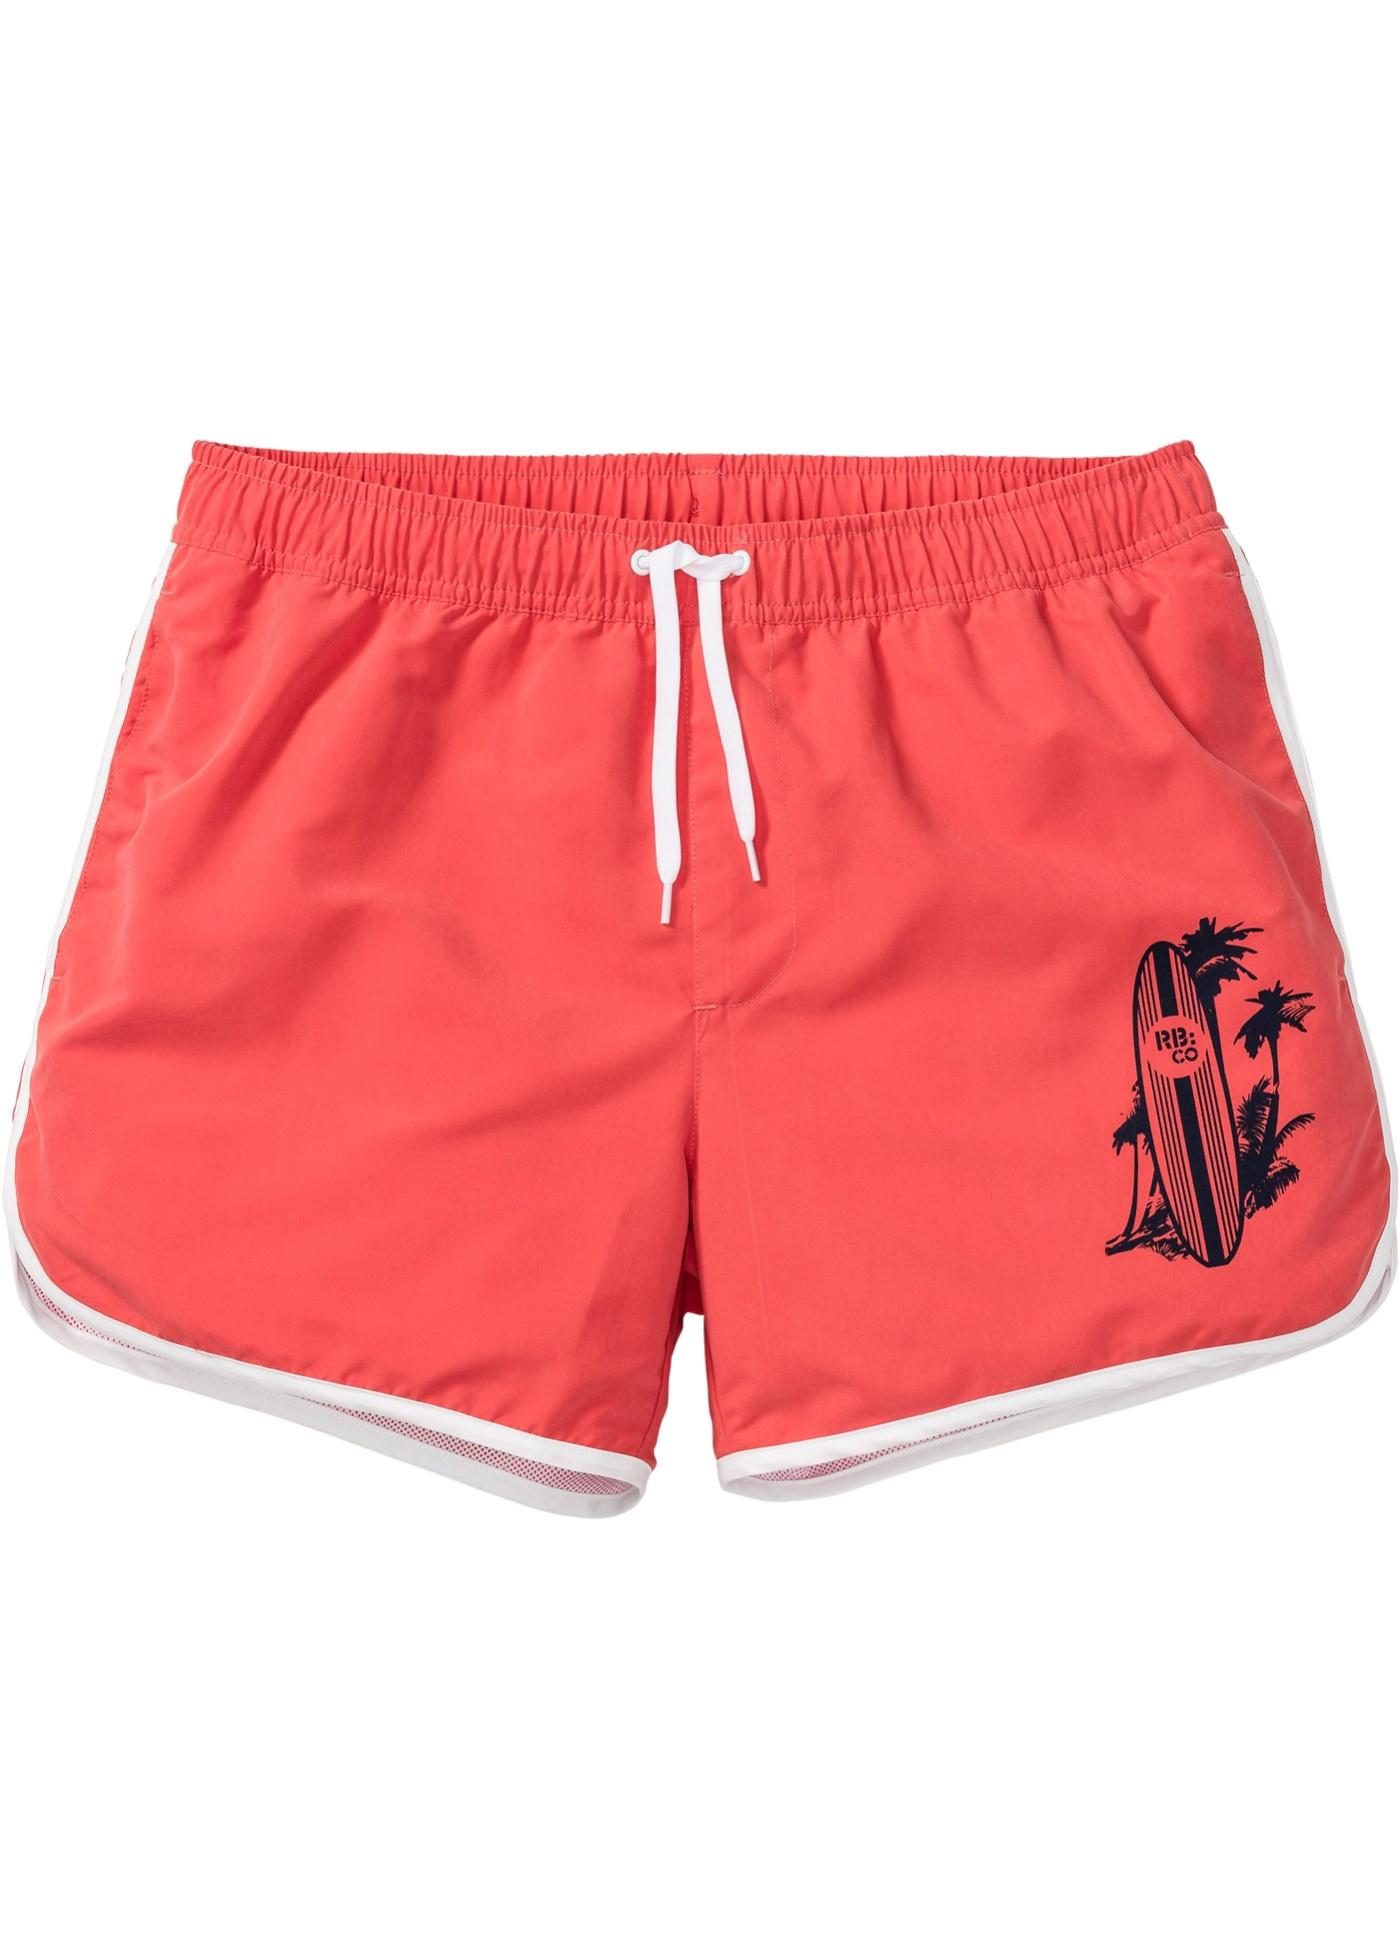 Pantaloncino da spiaggia regular fit (Rosso) - RAINBOW